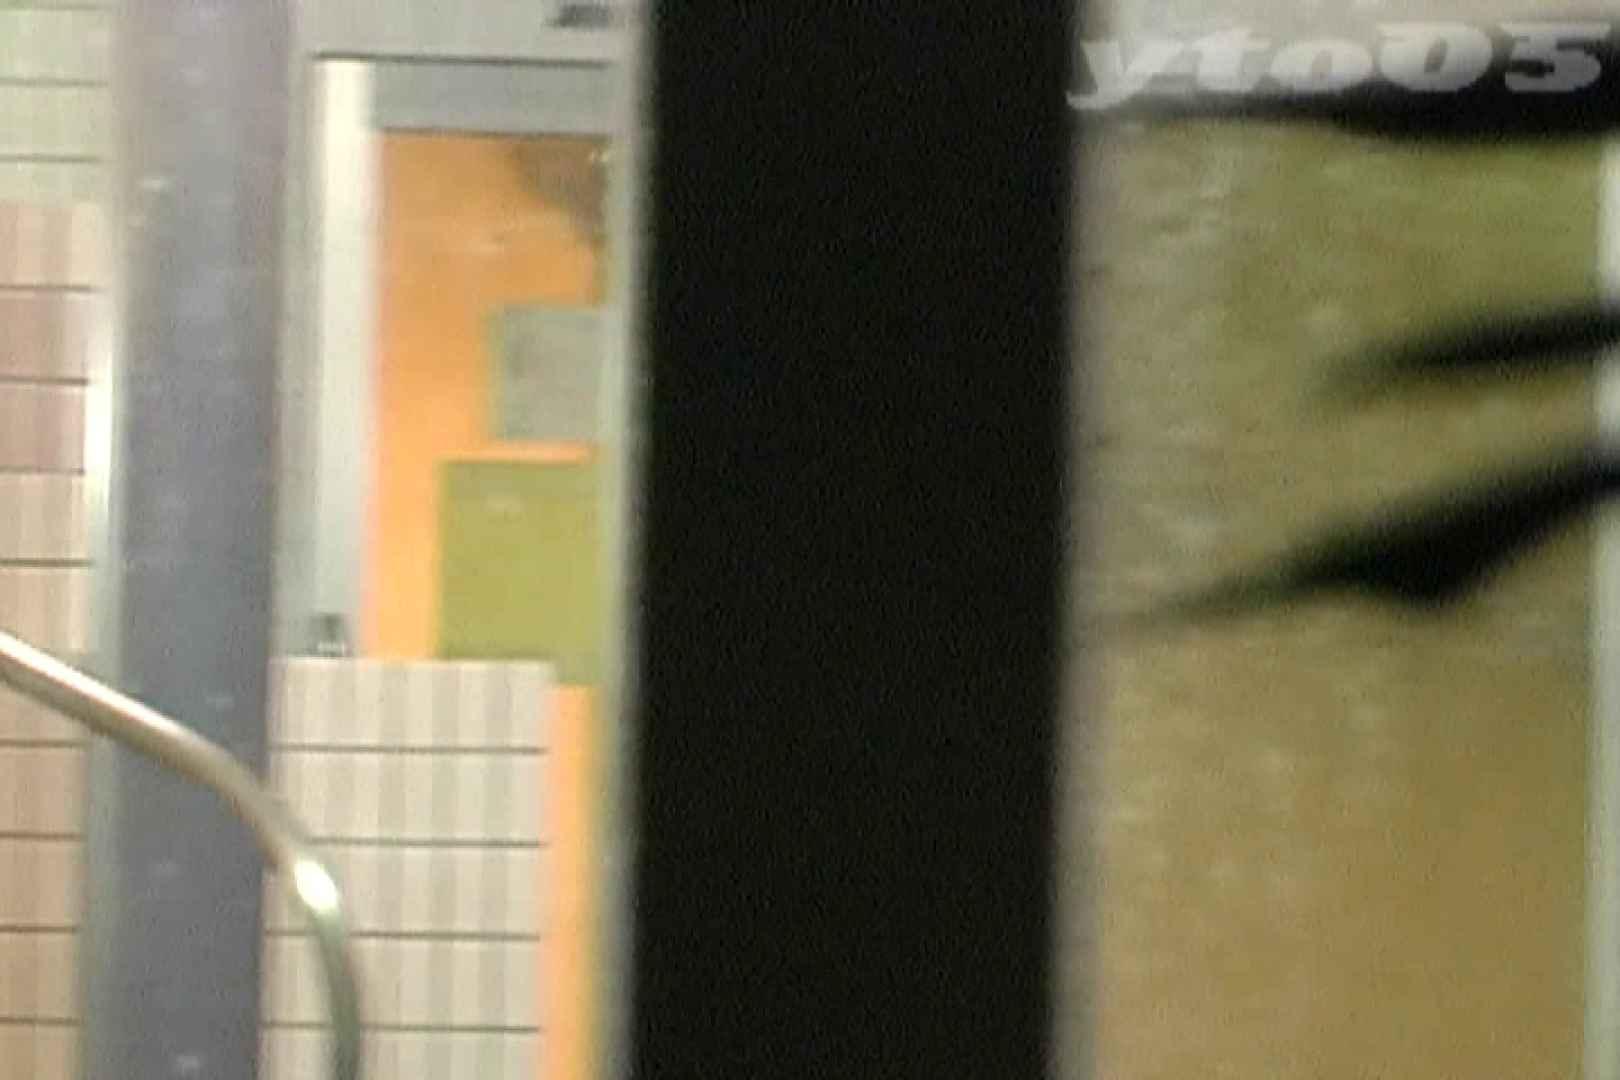 ▲復活限定▲合宿ホテル女風呂盗撮 Vol.28 盗撮編 オメコ無修正動画無料 93枚 84